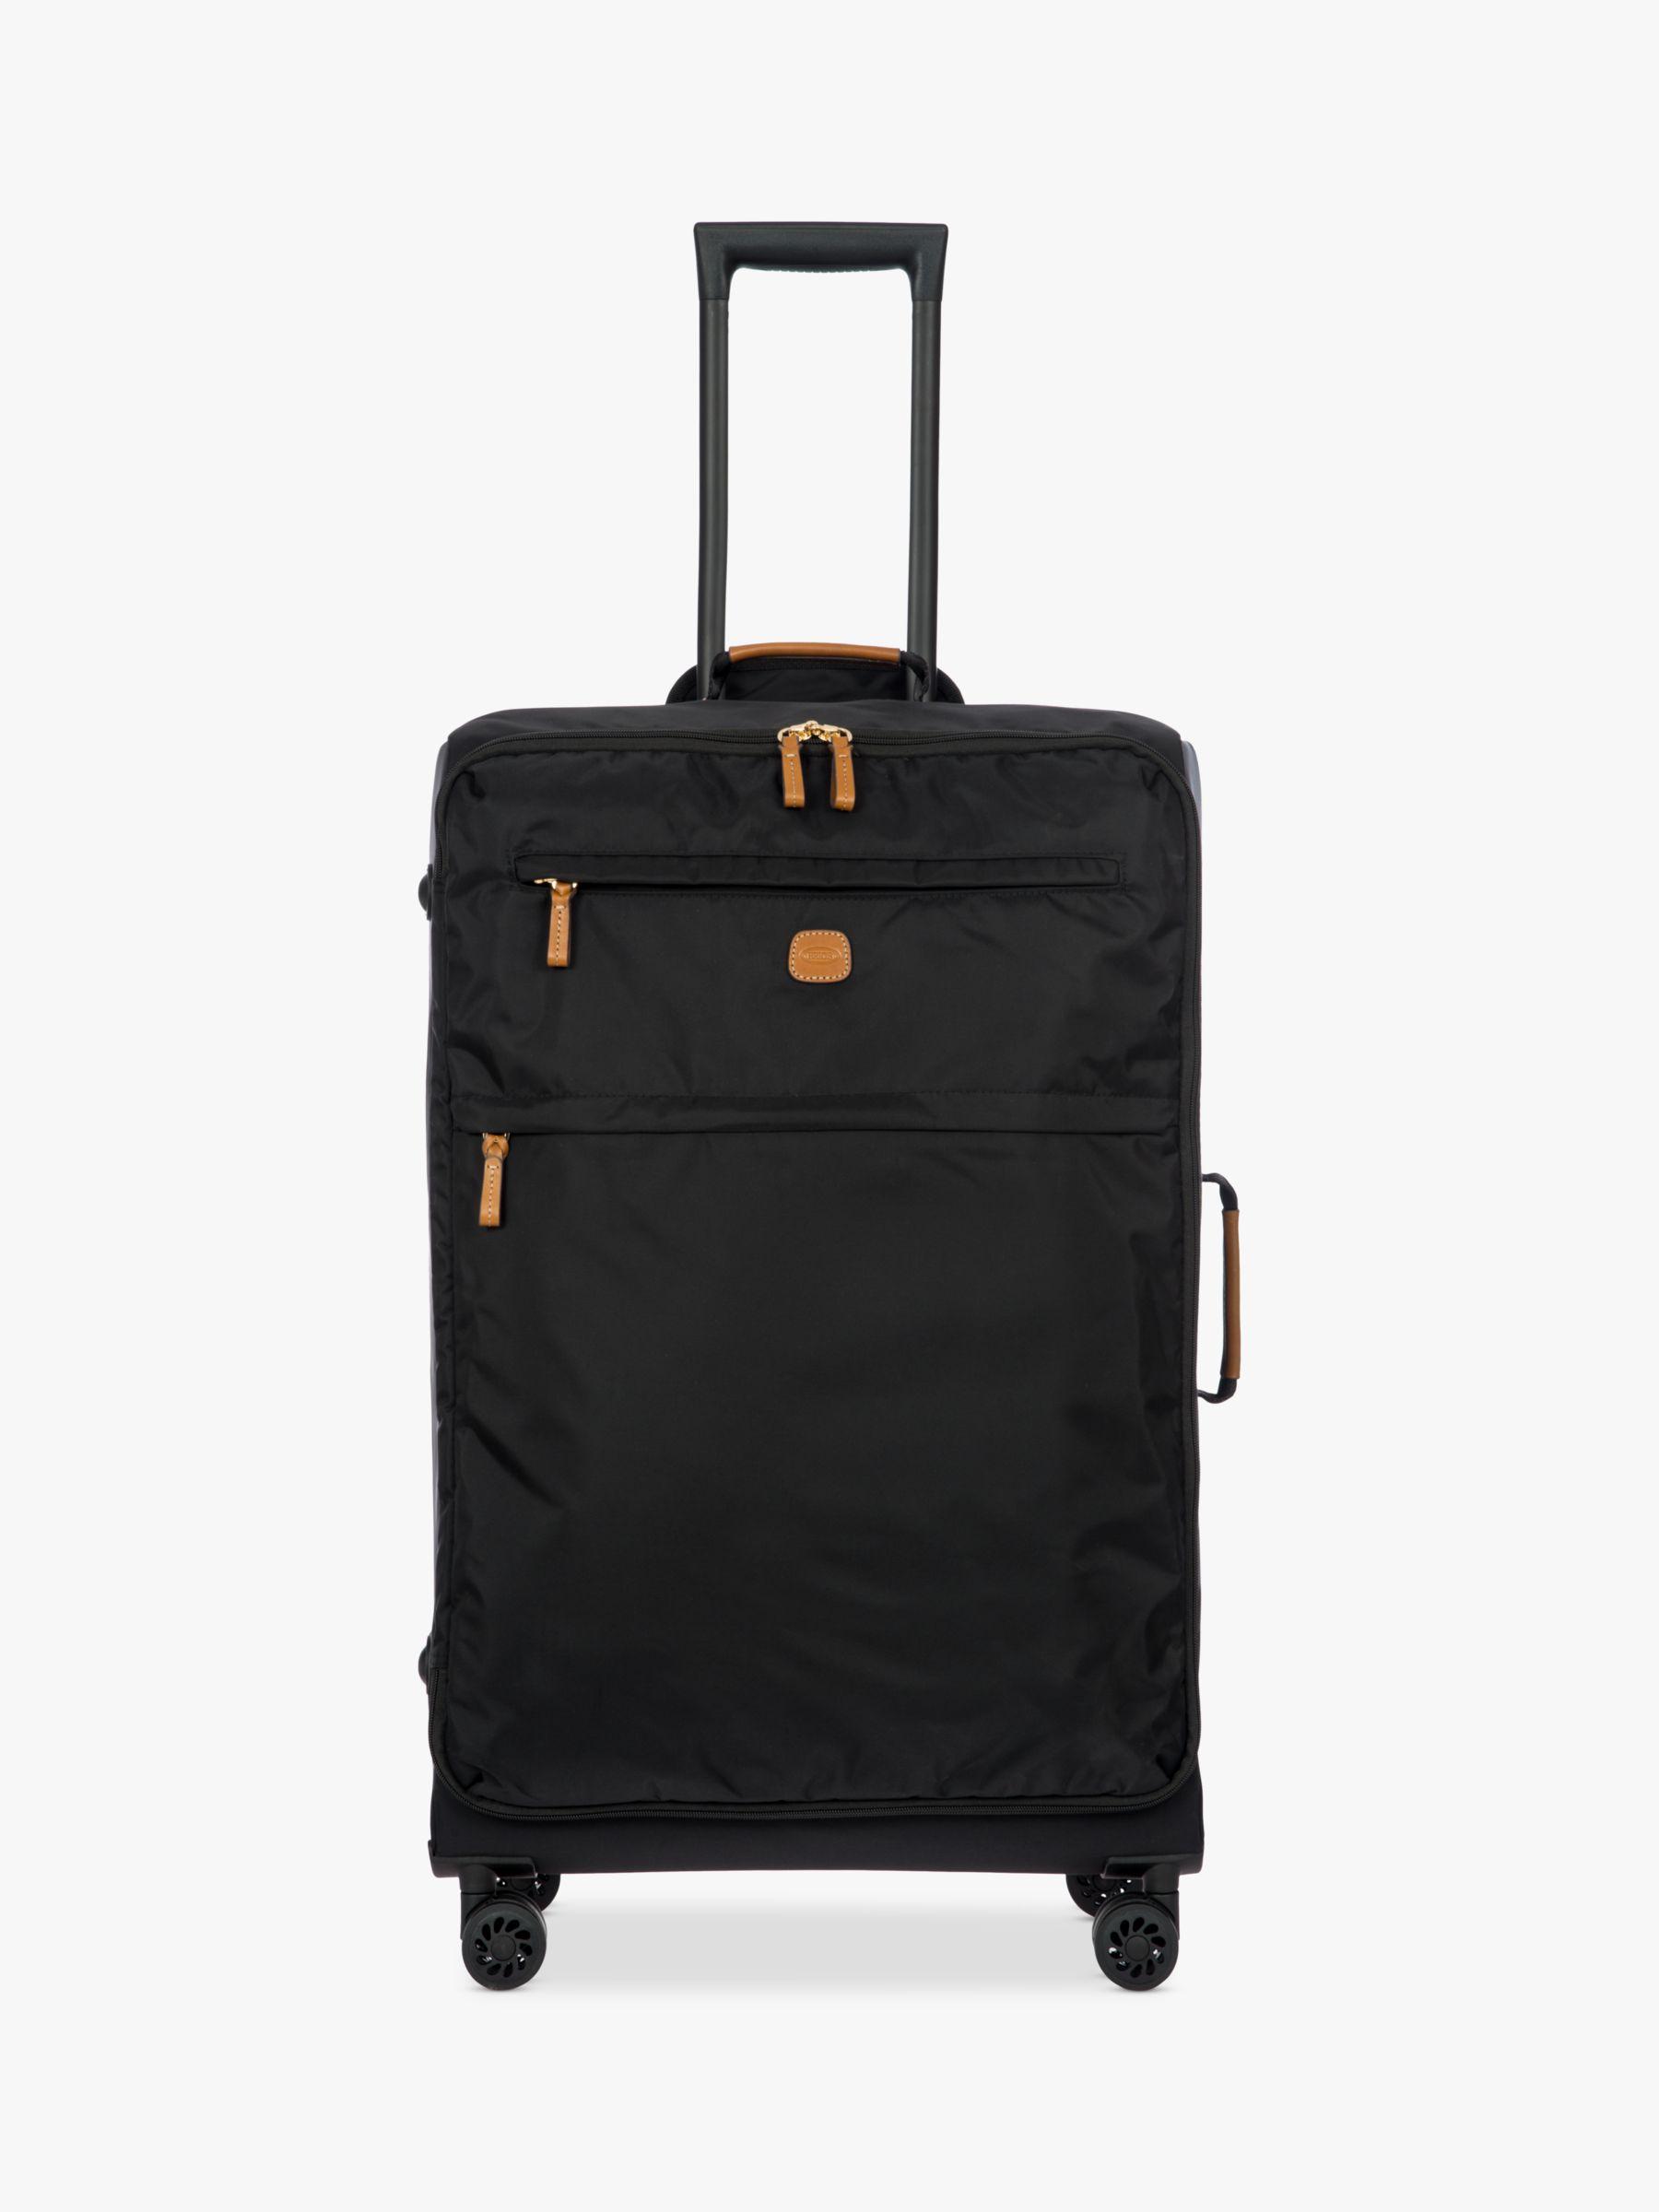 Bric's Bric's X Travel 77cm 4-Wheel Large Suitcase